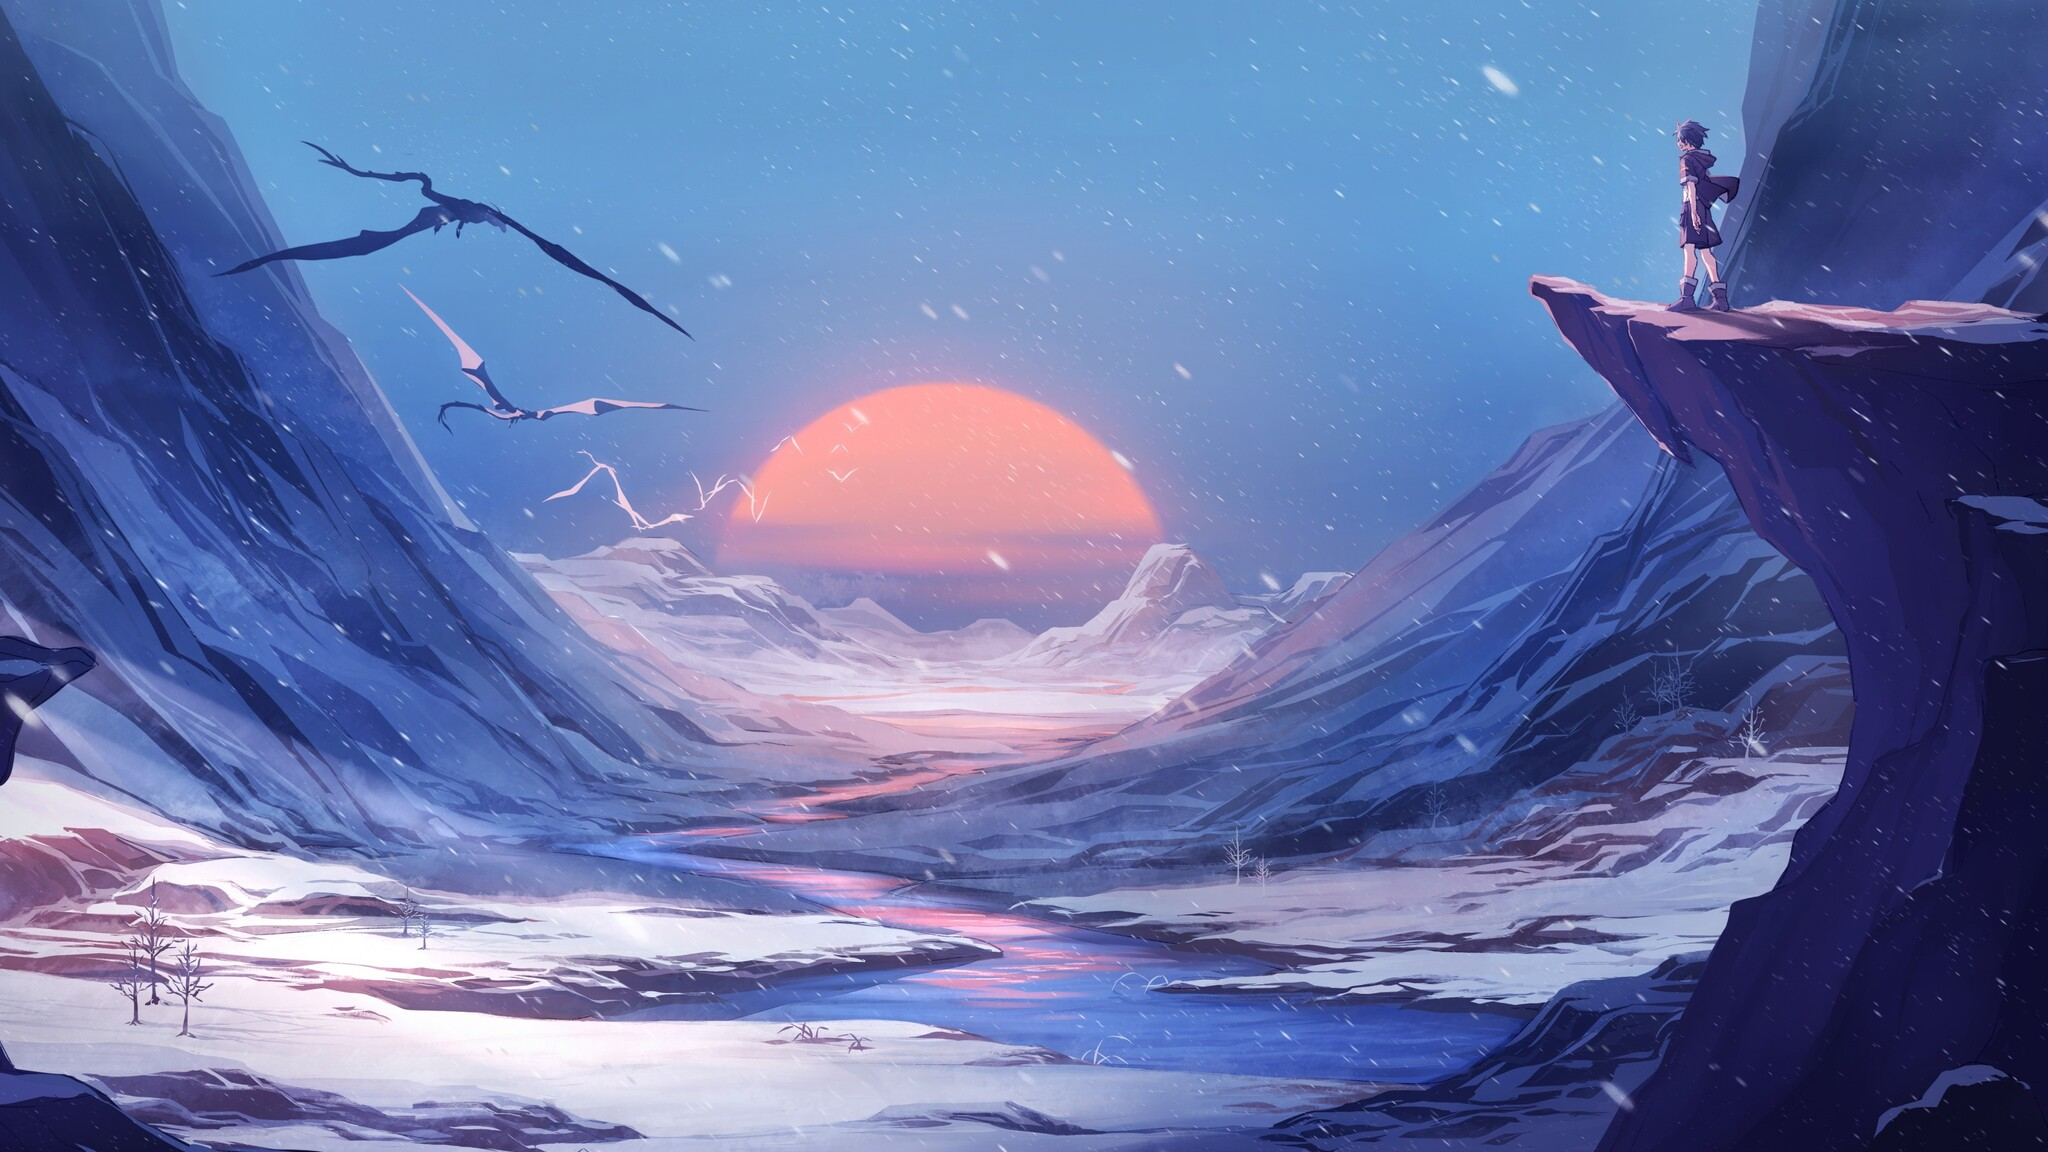 2048x1152 Dragon Winter Snow Anime Manga 4k 2048x1152